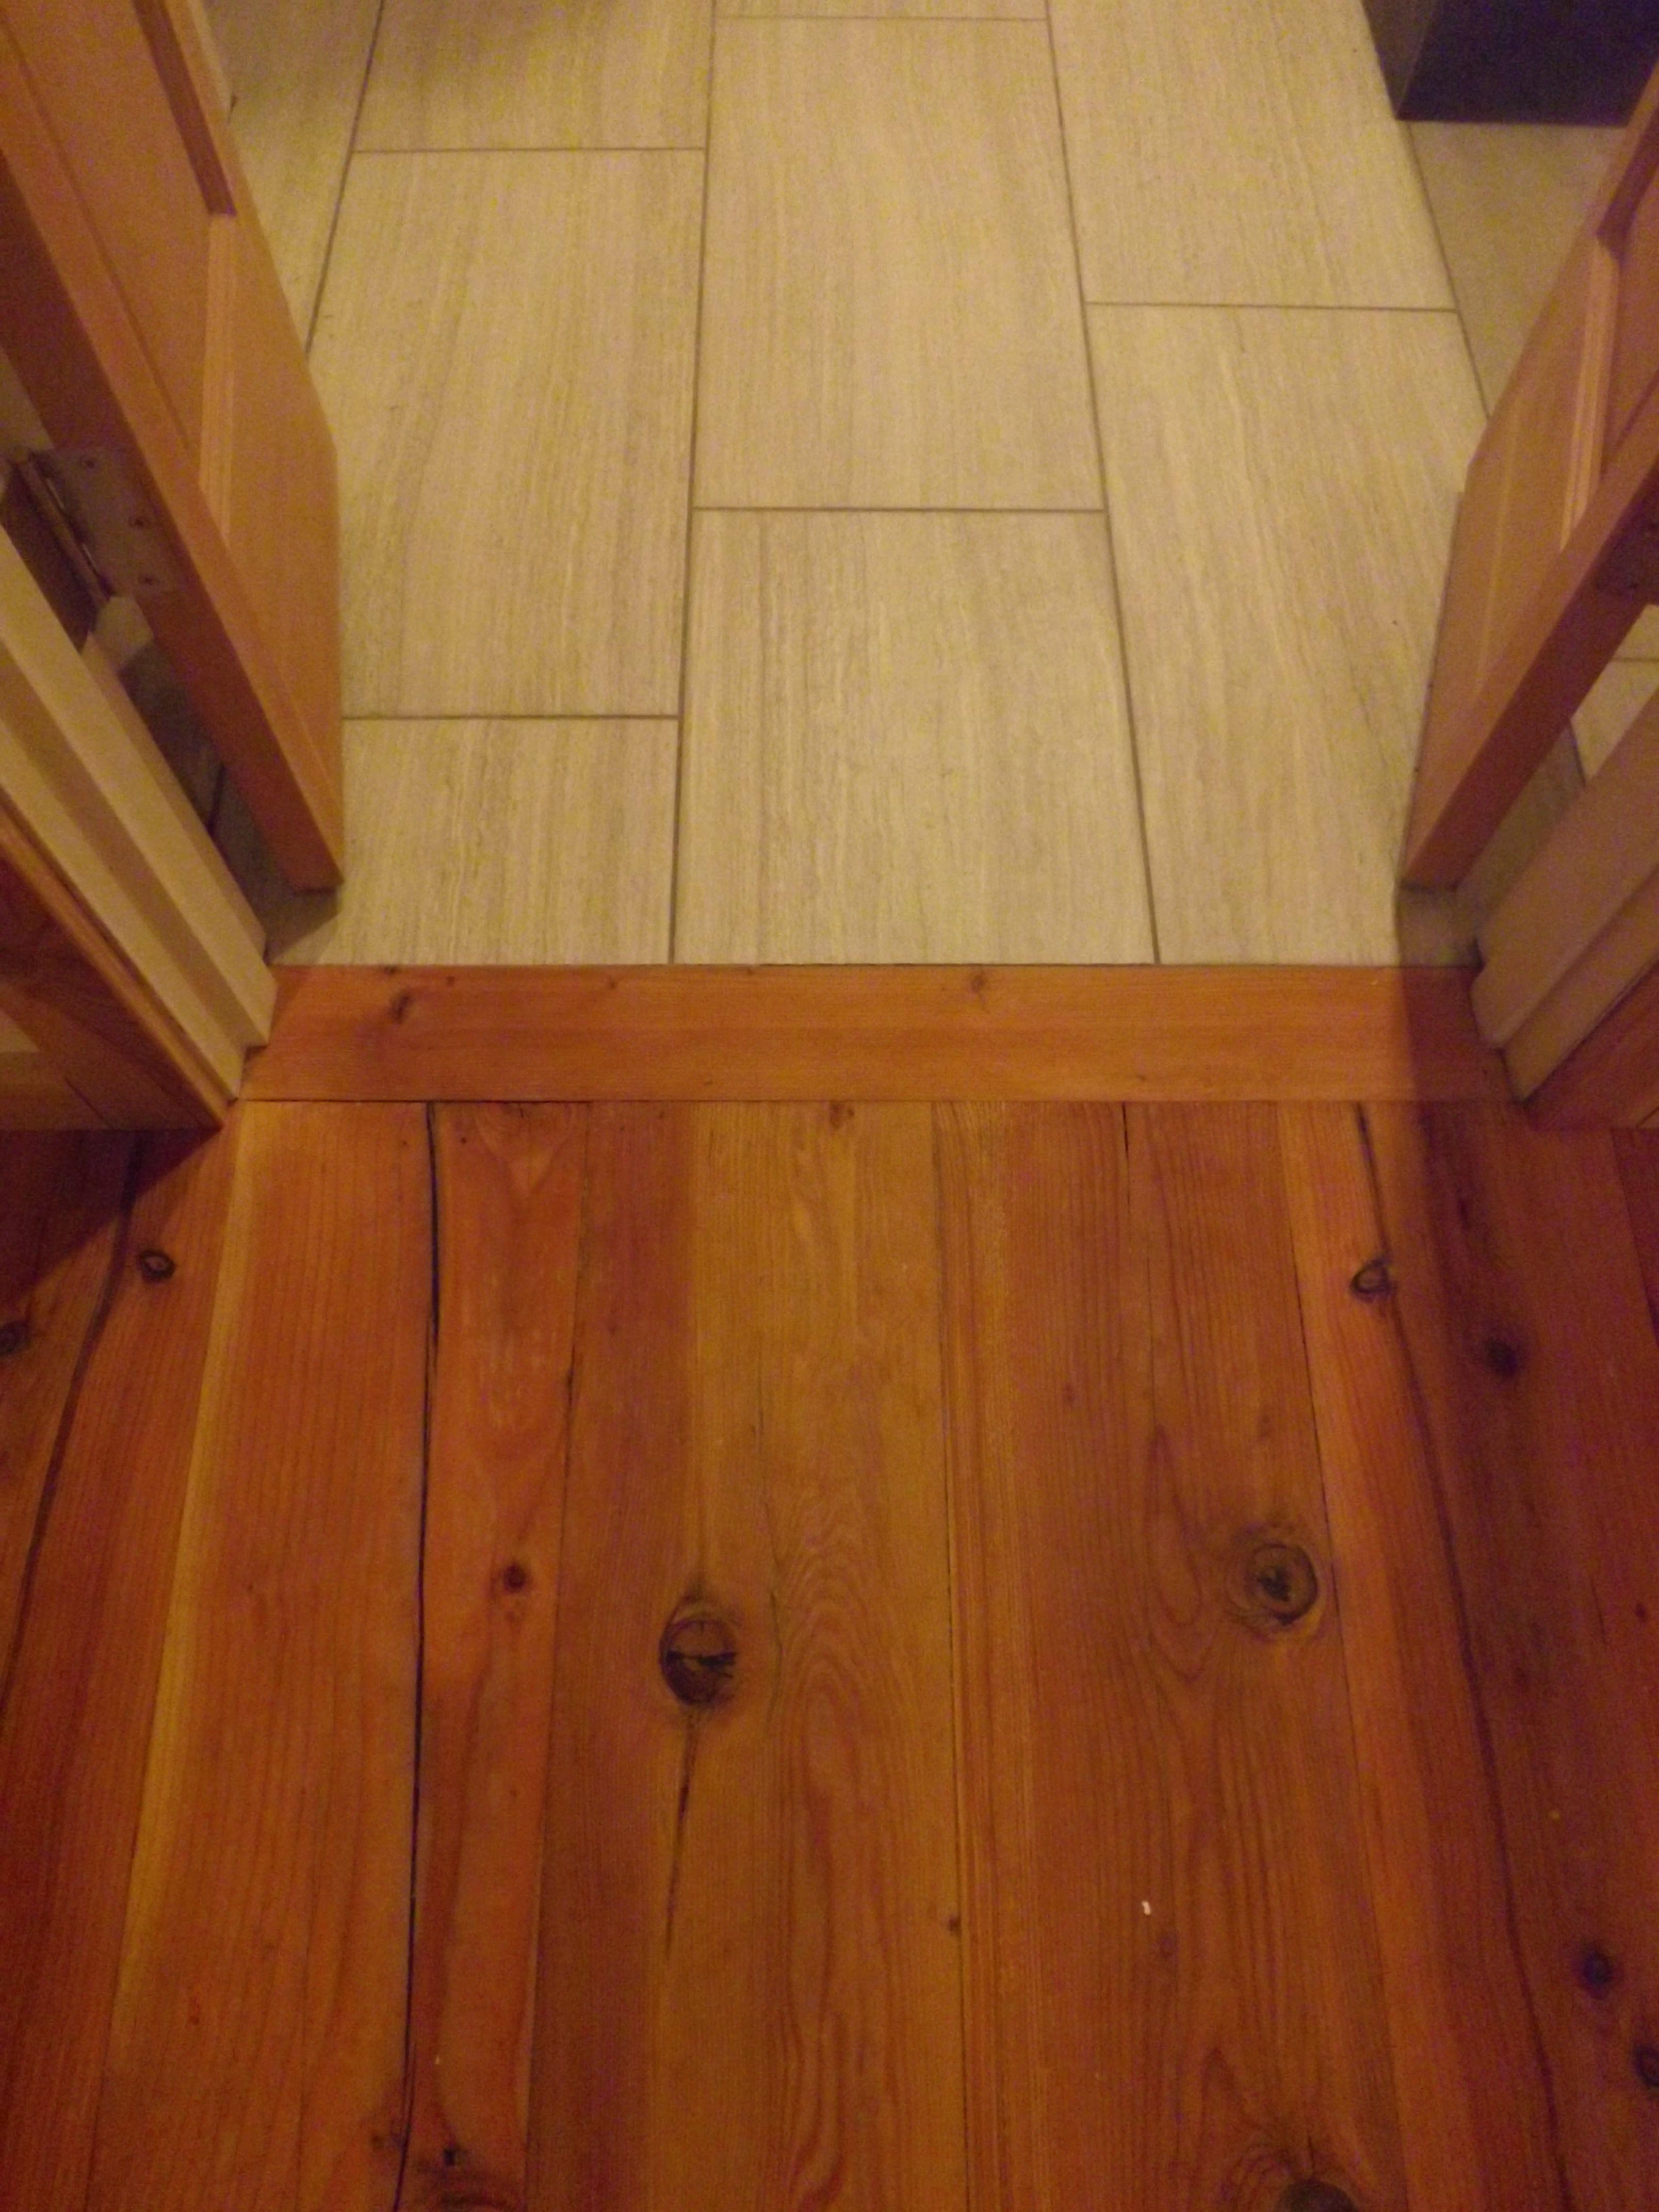 Tile To Wood Floor Transition Transition From Bedroom Wood Floors To Porcelain Bathroom Floors Flooring Refinishing Hardwood Floors Refinishing Floors